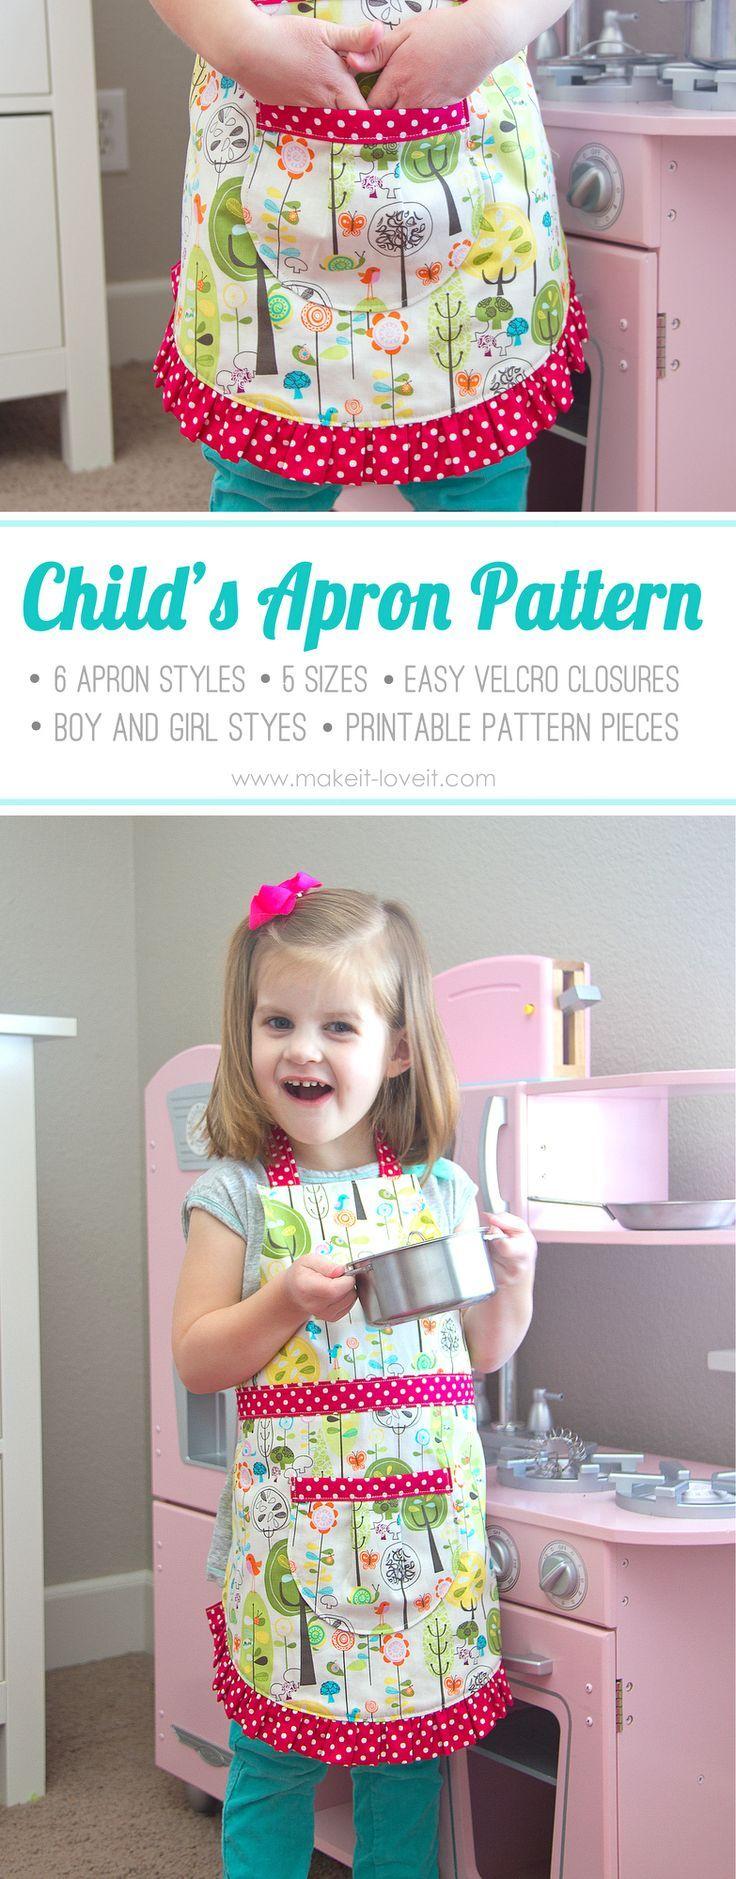 Ruffle Apron PDF Pattern (6 apron girl & boy styles, 5 sizes, easy Velcro closure, printable pattern pieces) | via Make It and Love It #iloverileyblake